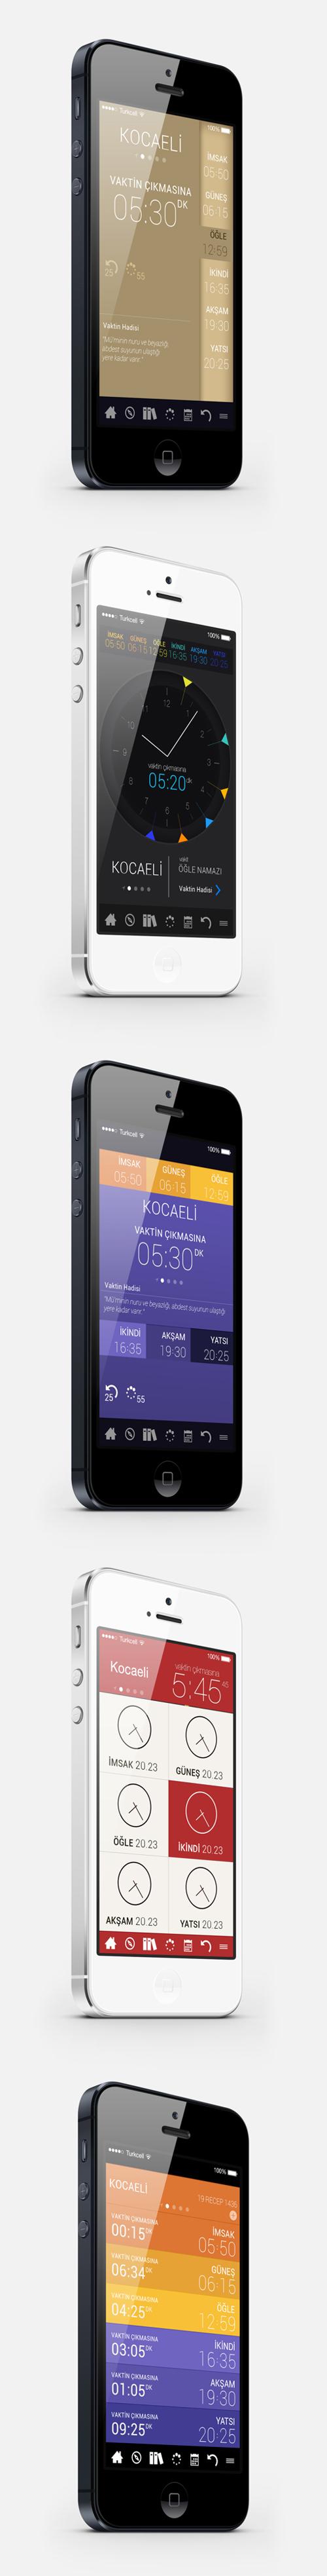 Namaz Mobile App UI UX Design for Inspiration